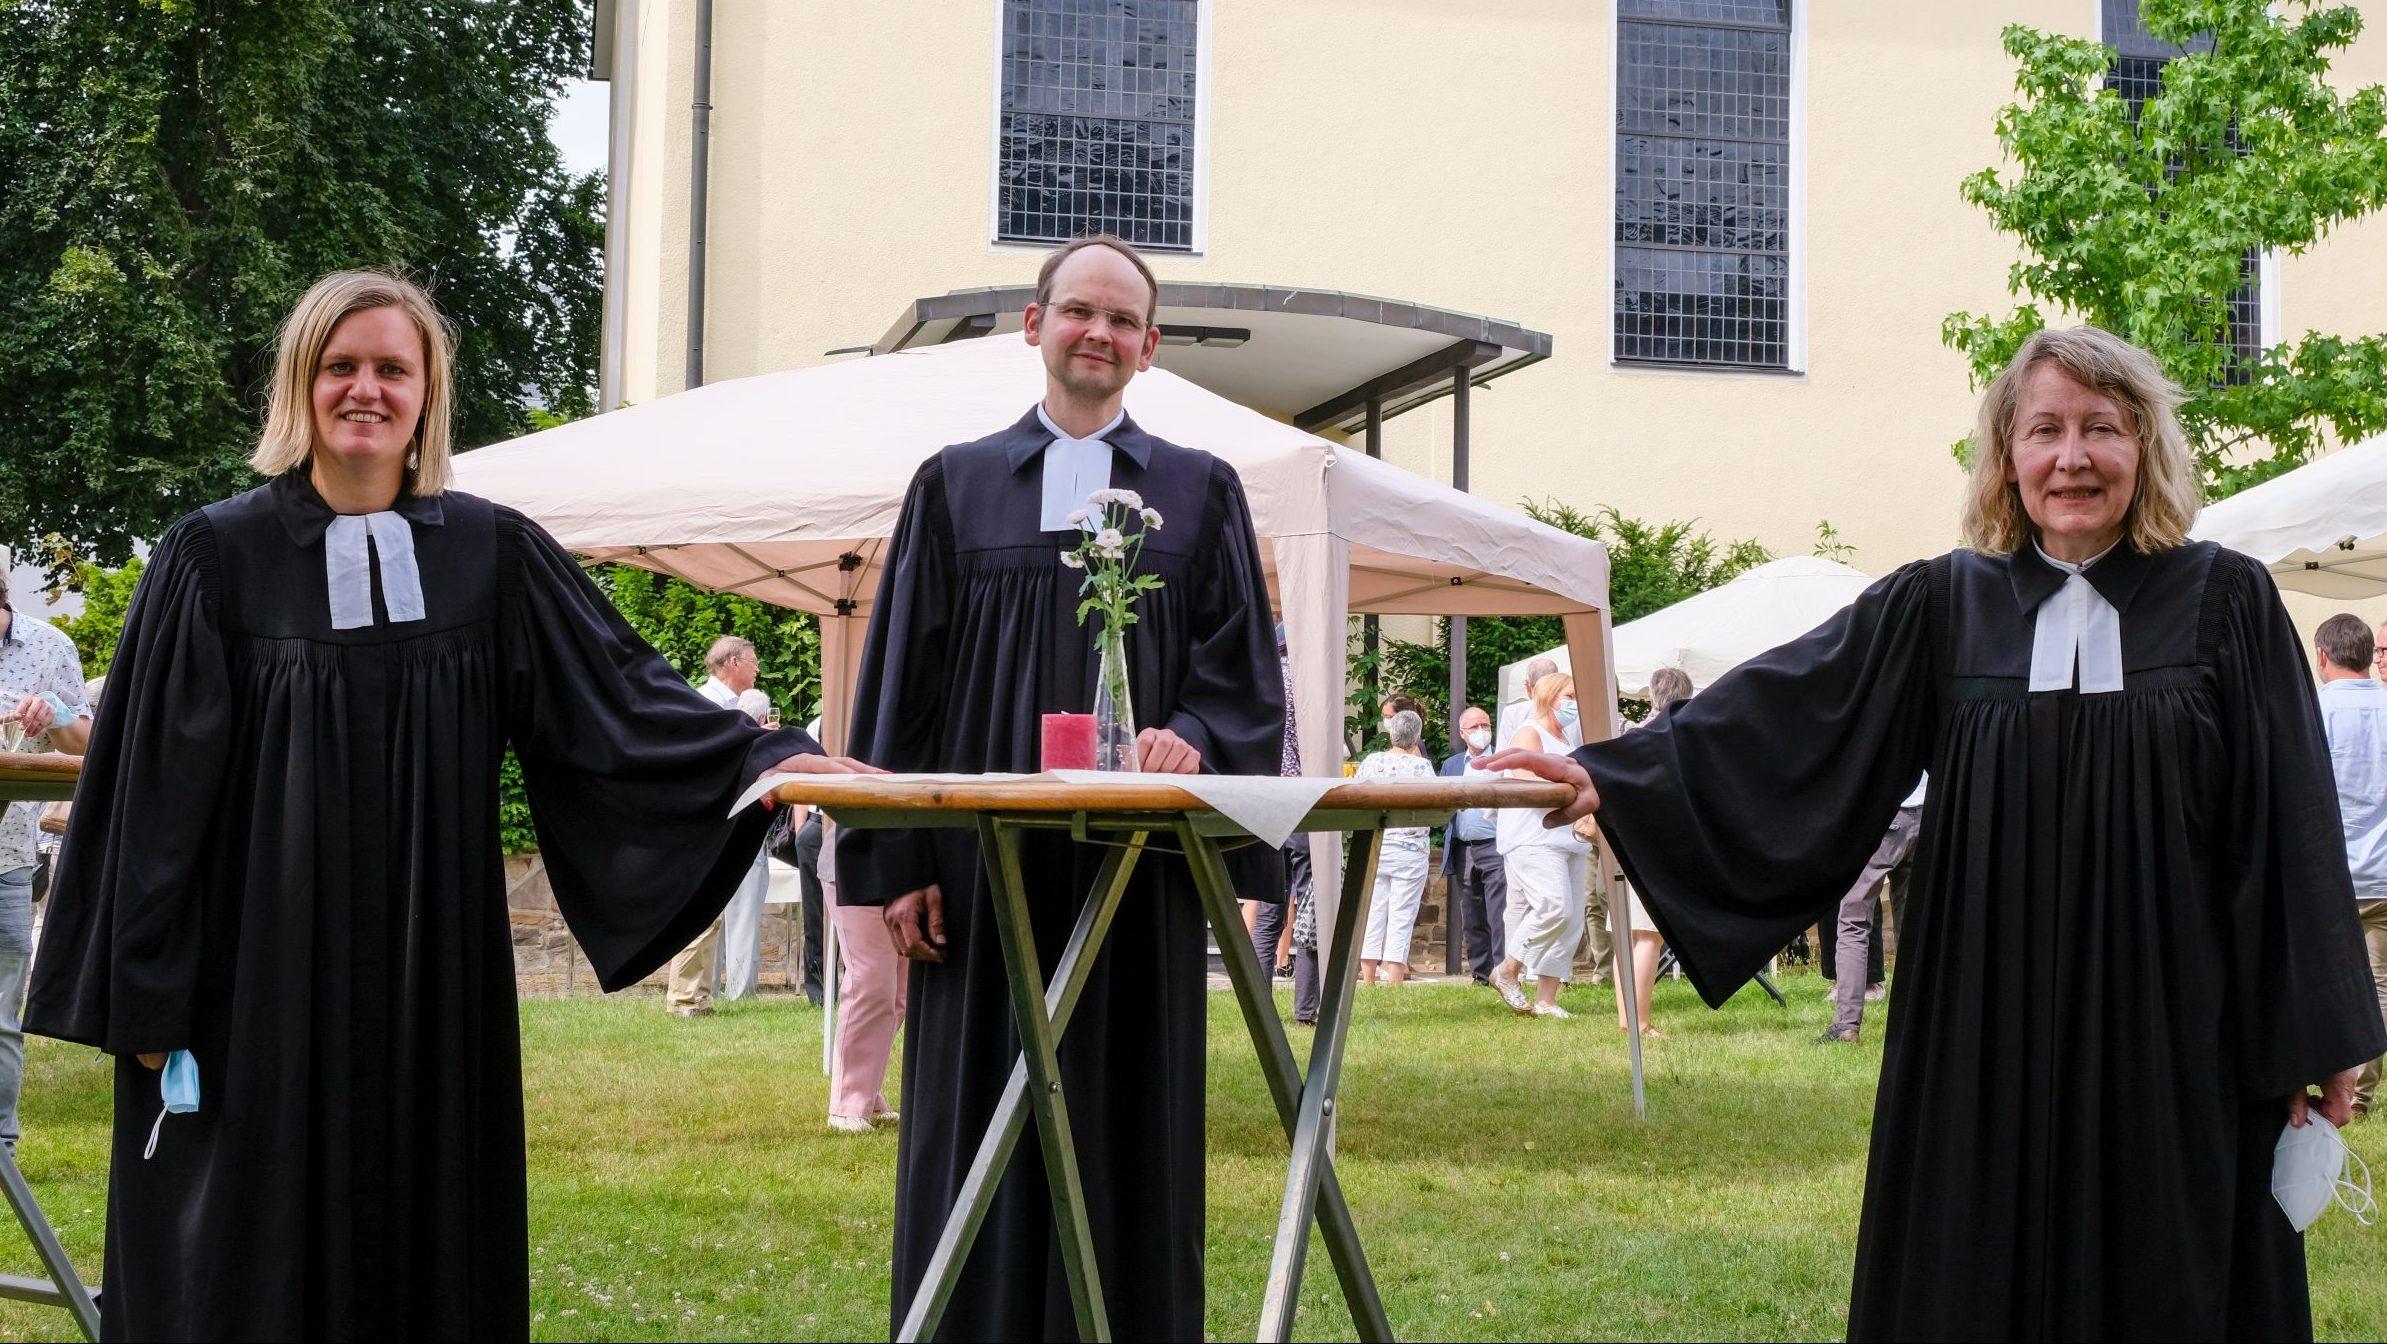 Florian Hankwitz neuer Pfarrer in Köln Kalk-Humboldt